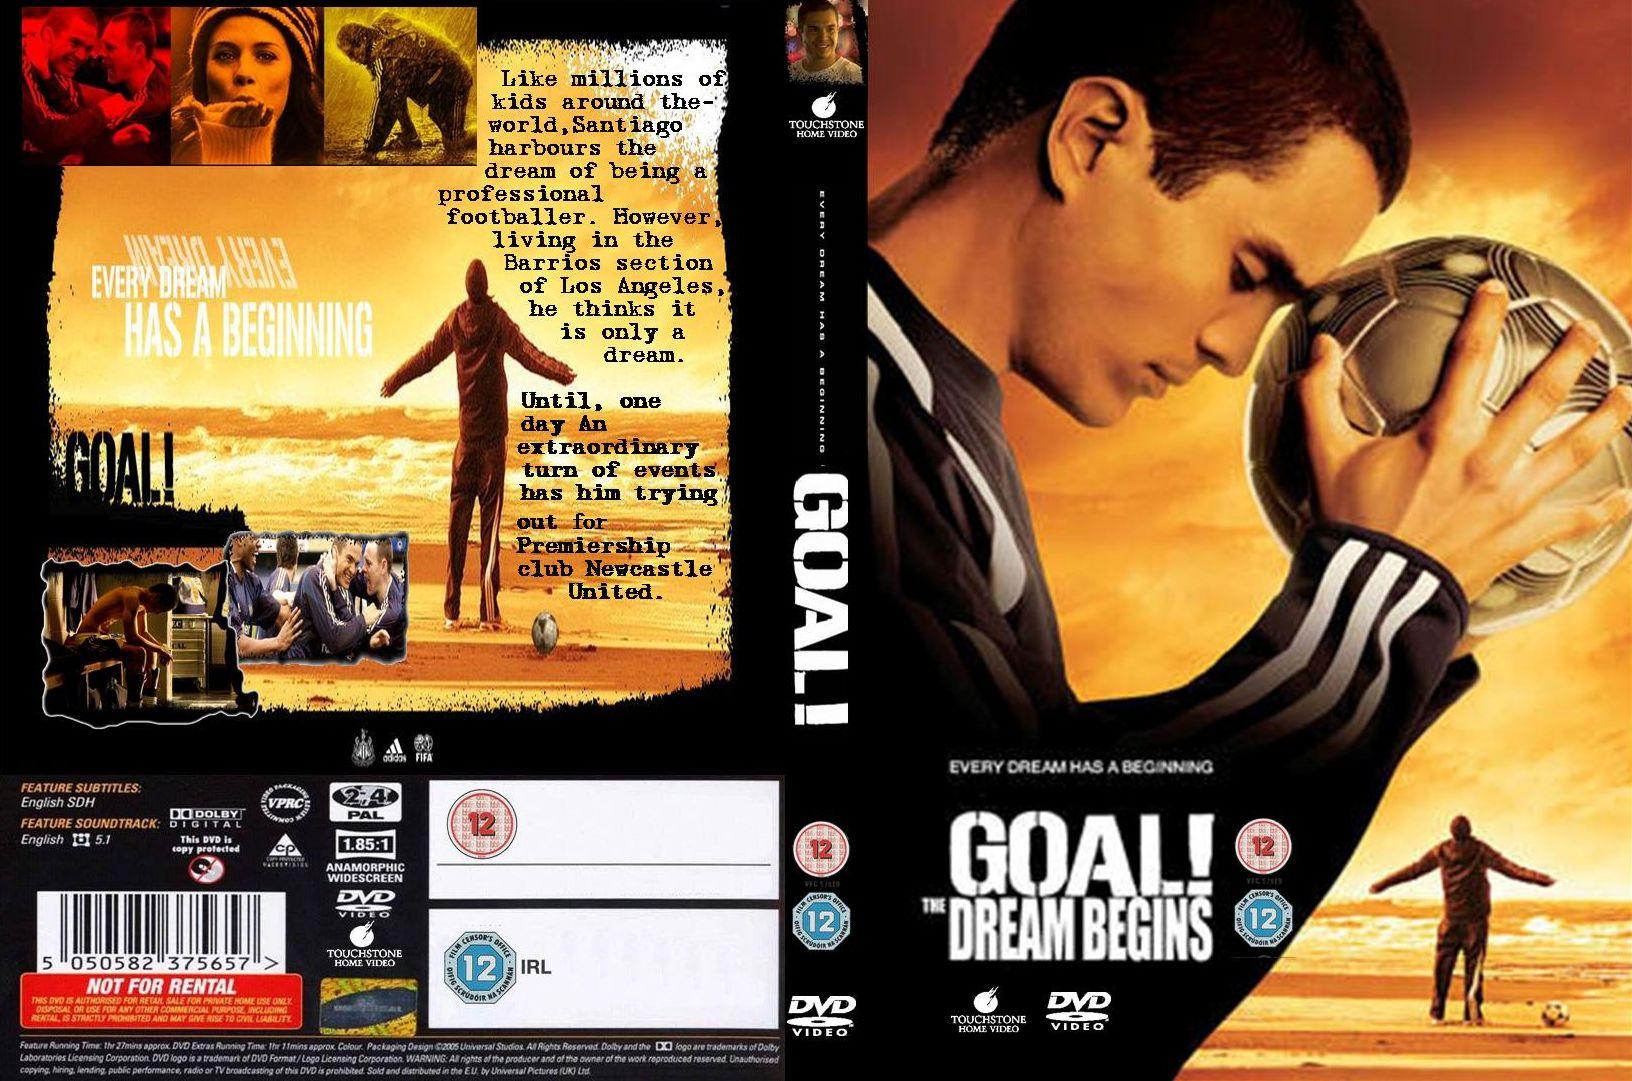 COVERS BOX SK ::: Goal The Dream Begins (2005) - high